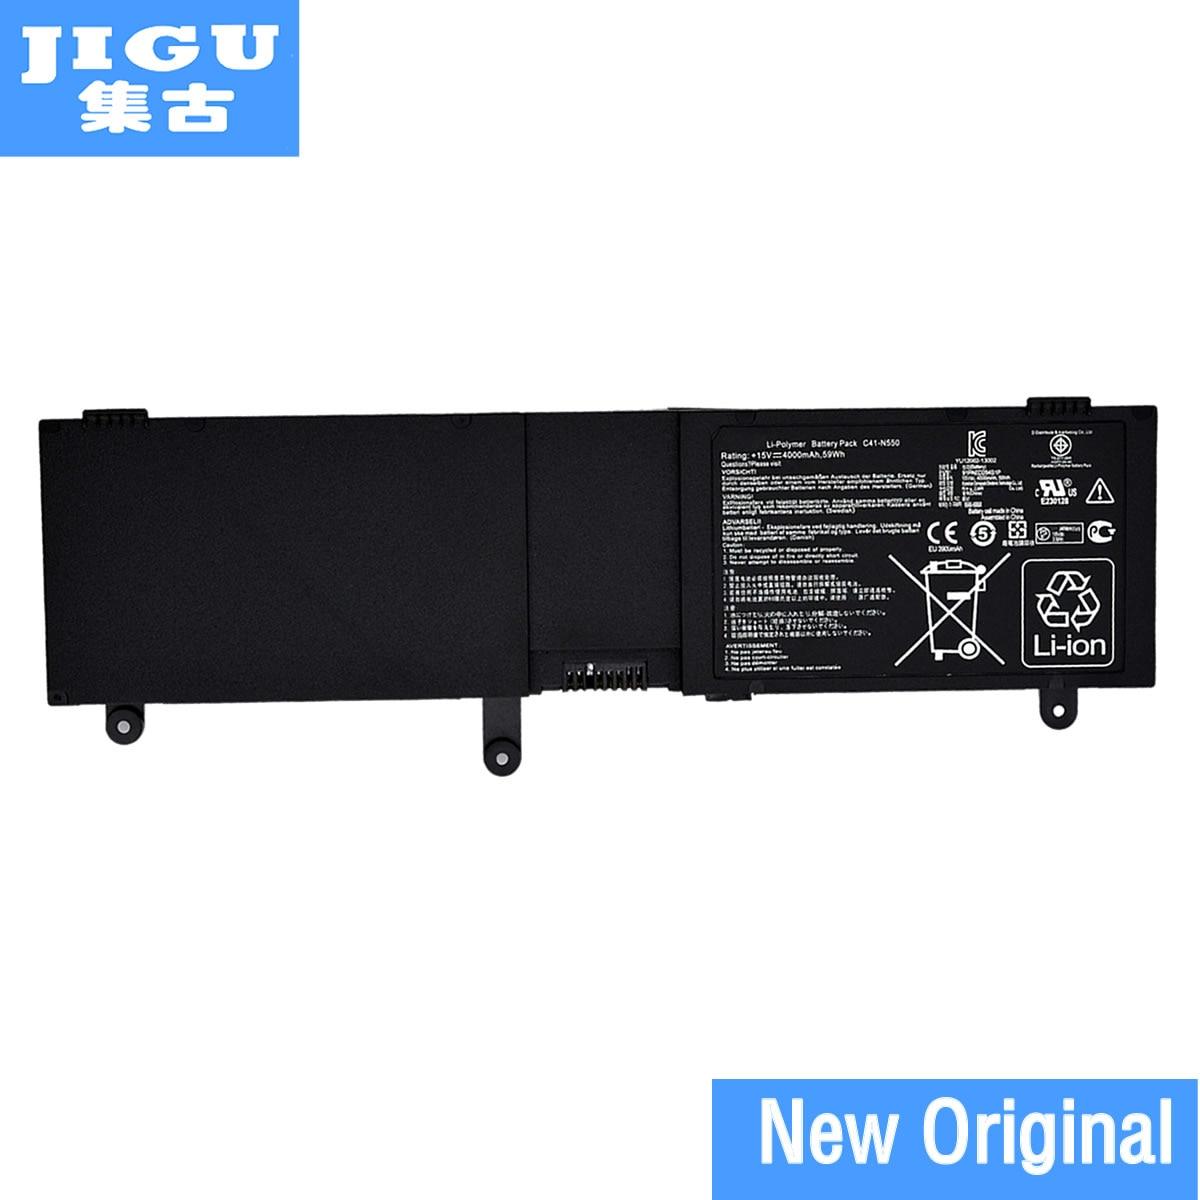 JIGU Laptop Battery C41-N550 FOR ASUS G550 G550J G550JK G550JK4700 N550JK N550JV ROG G550 G550J G550JK Series